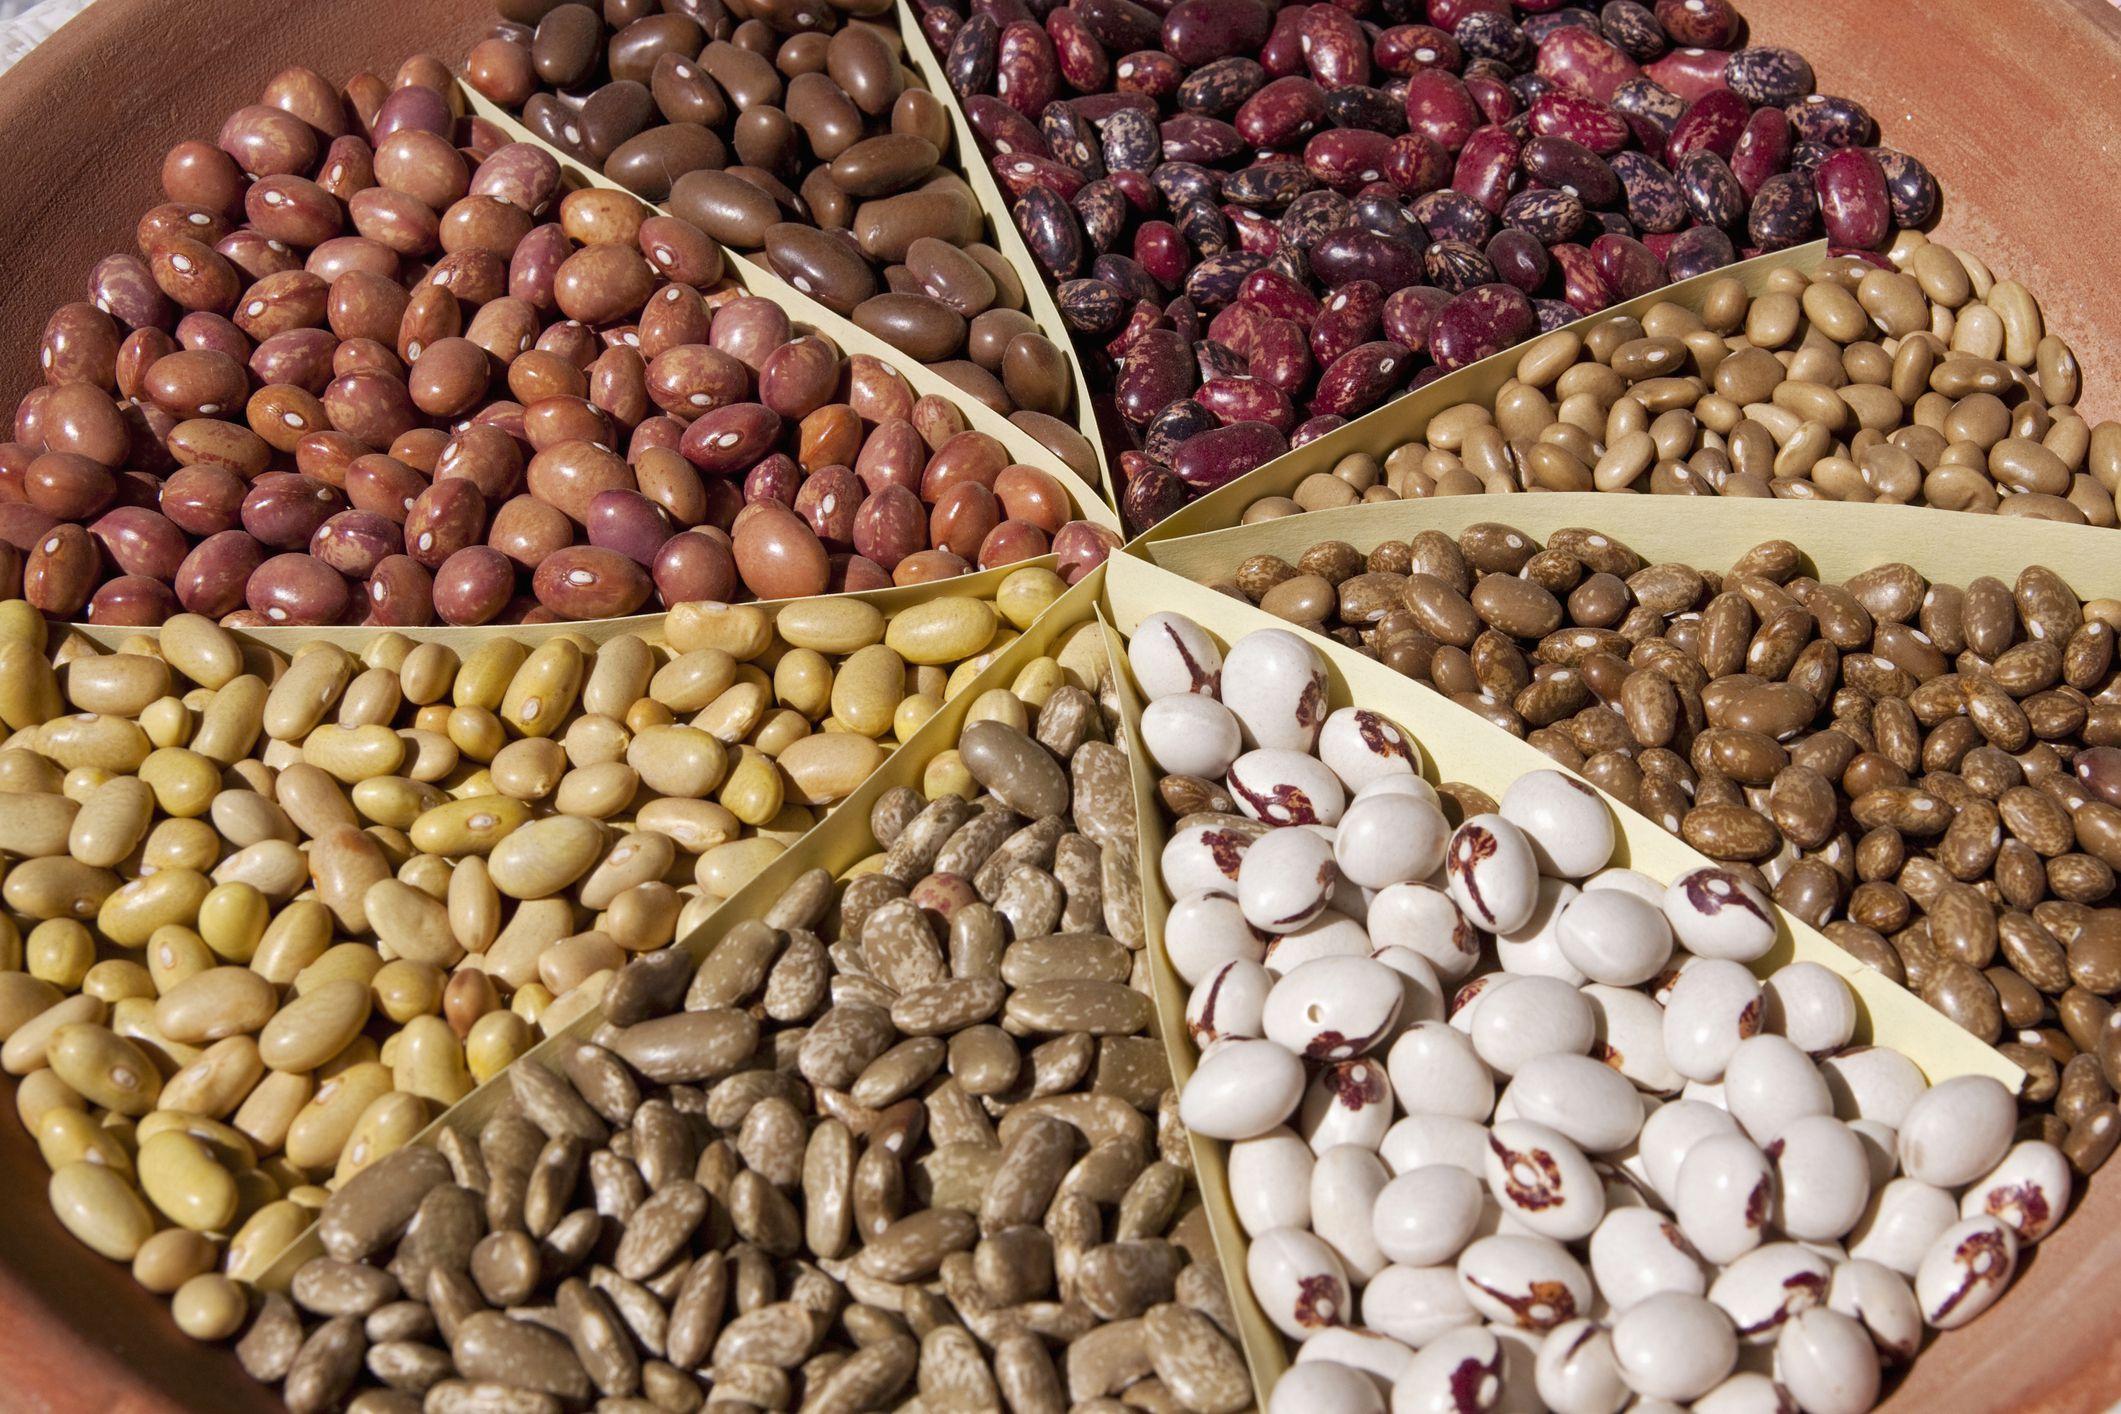 Safe Gluten-Free Bean Options